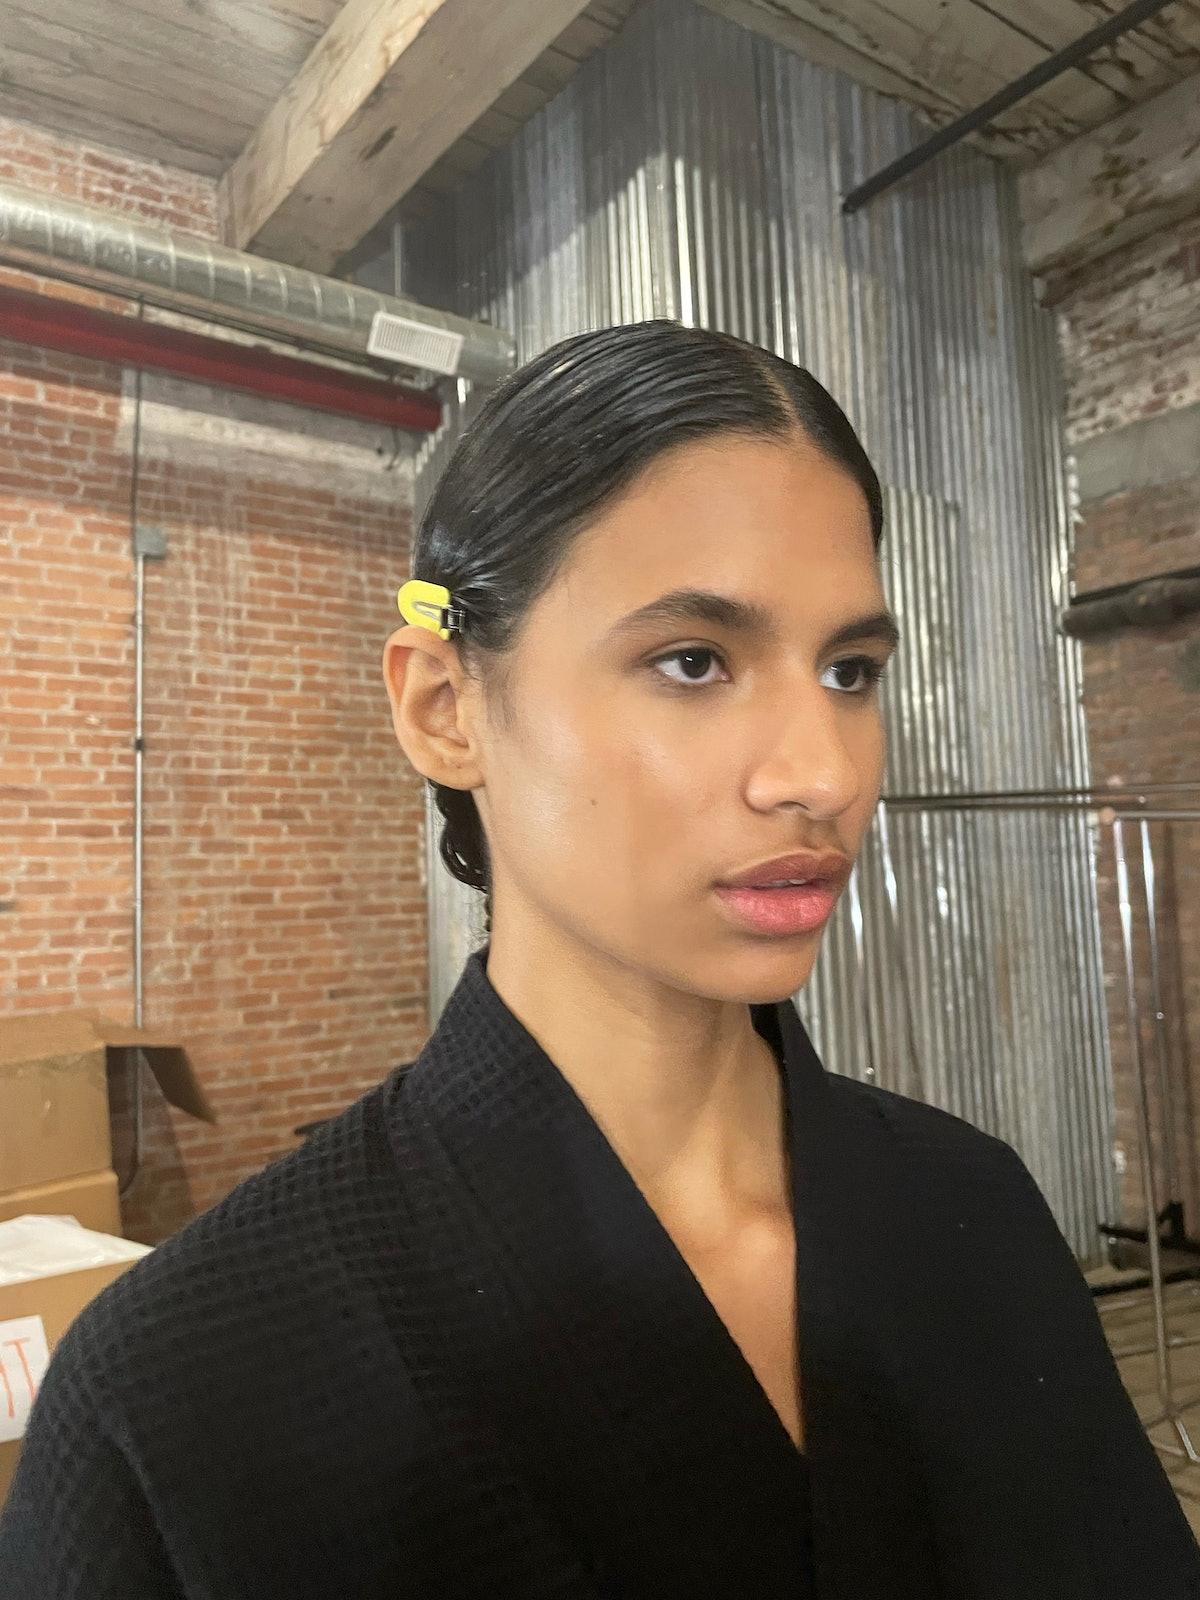 Gabriela Hearst backstage